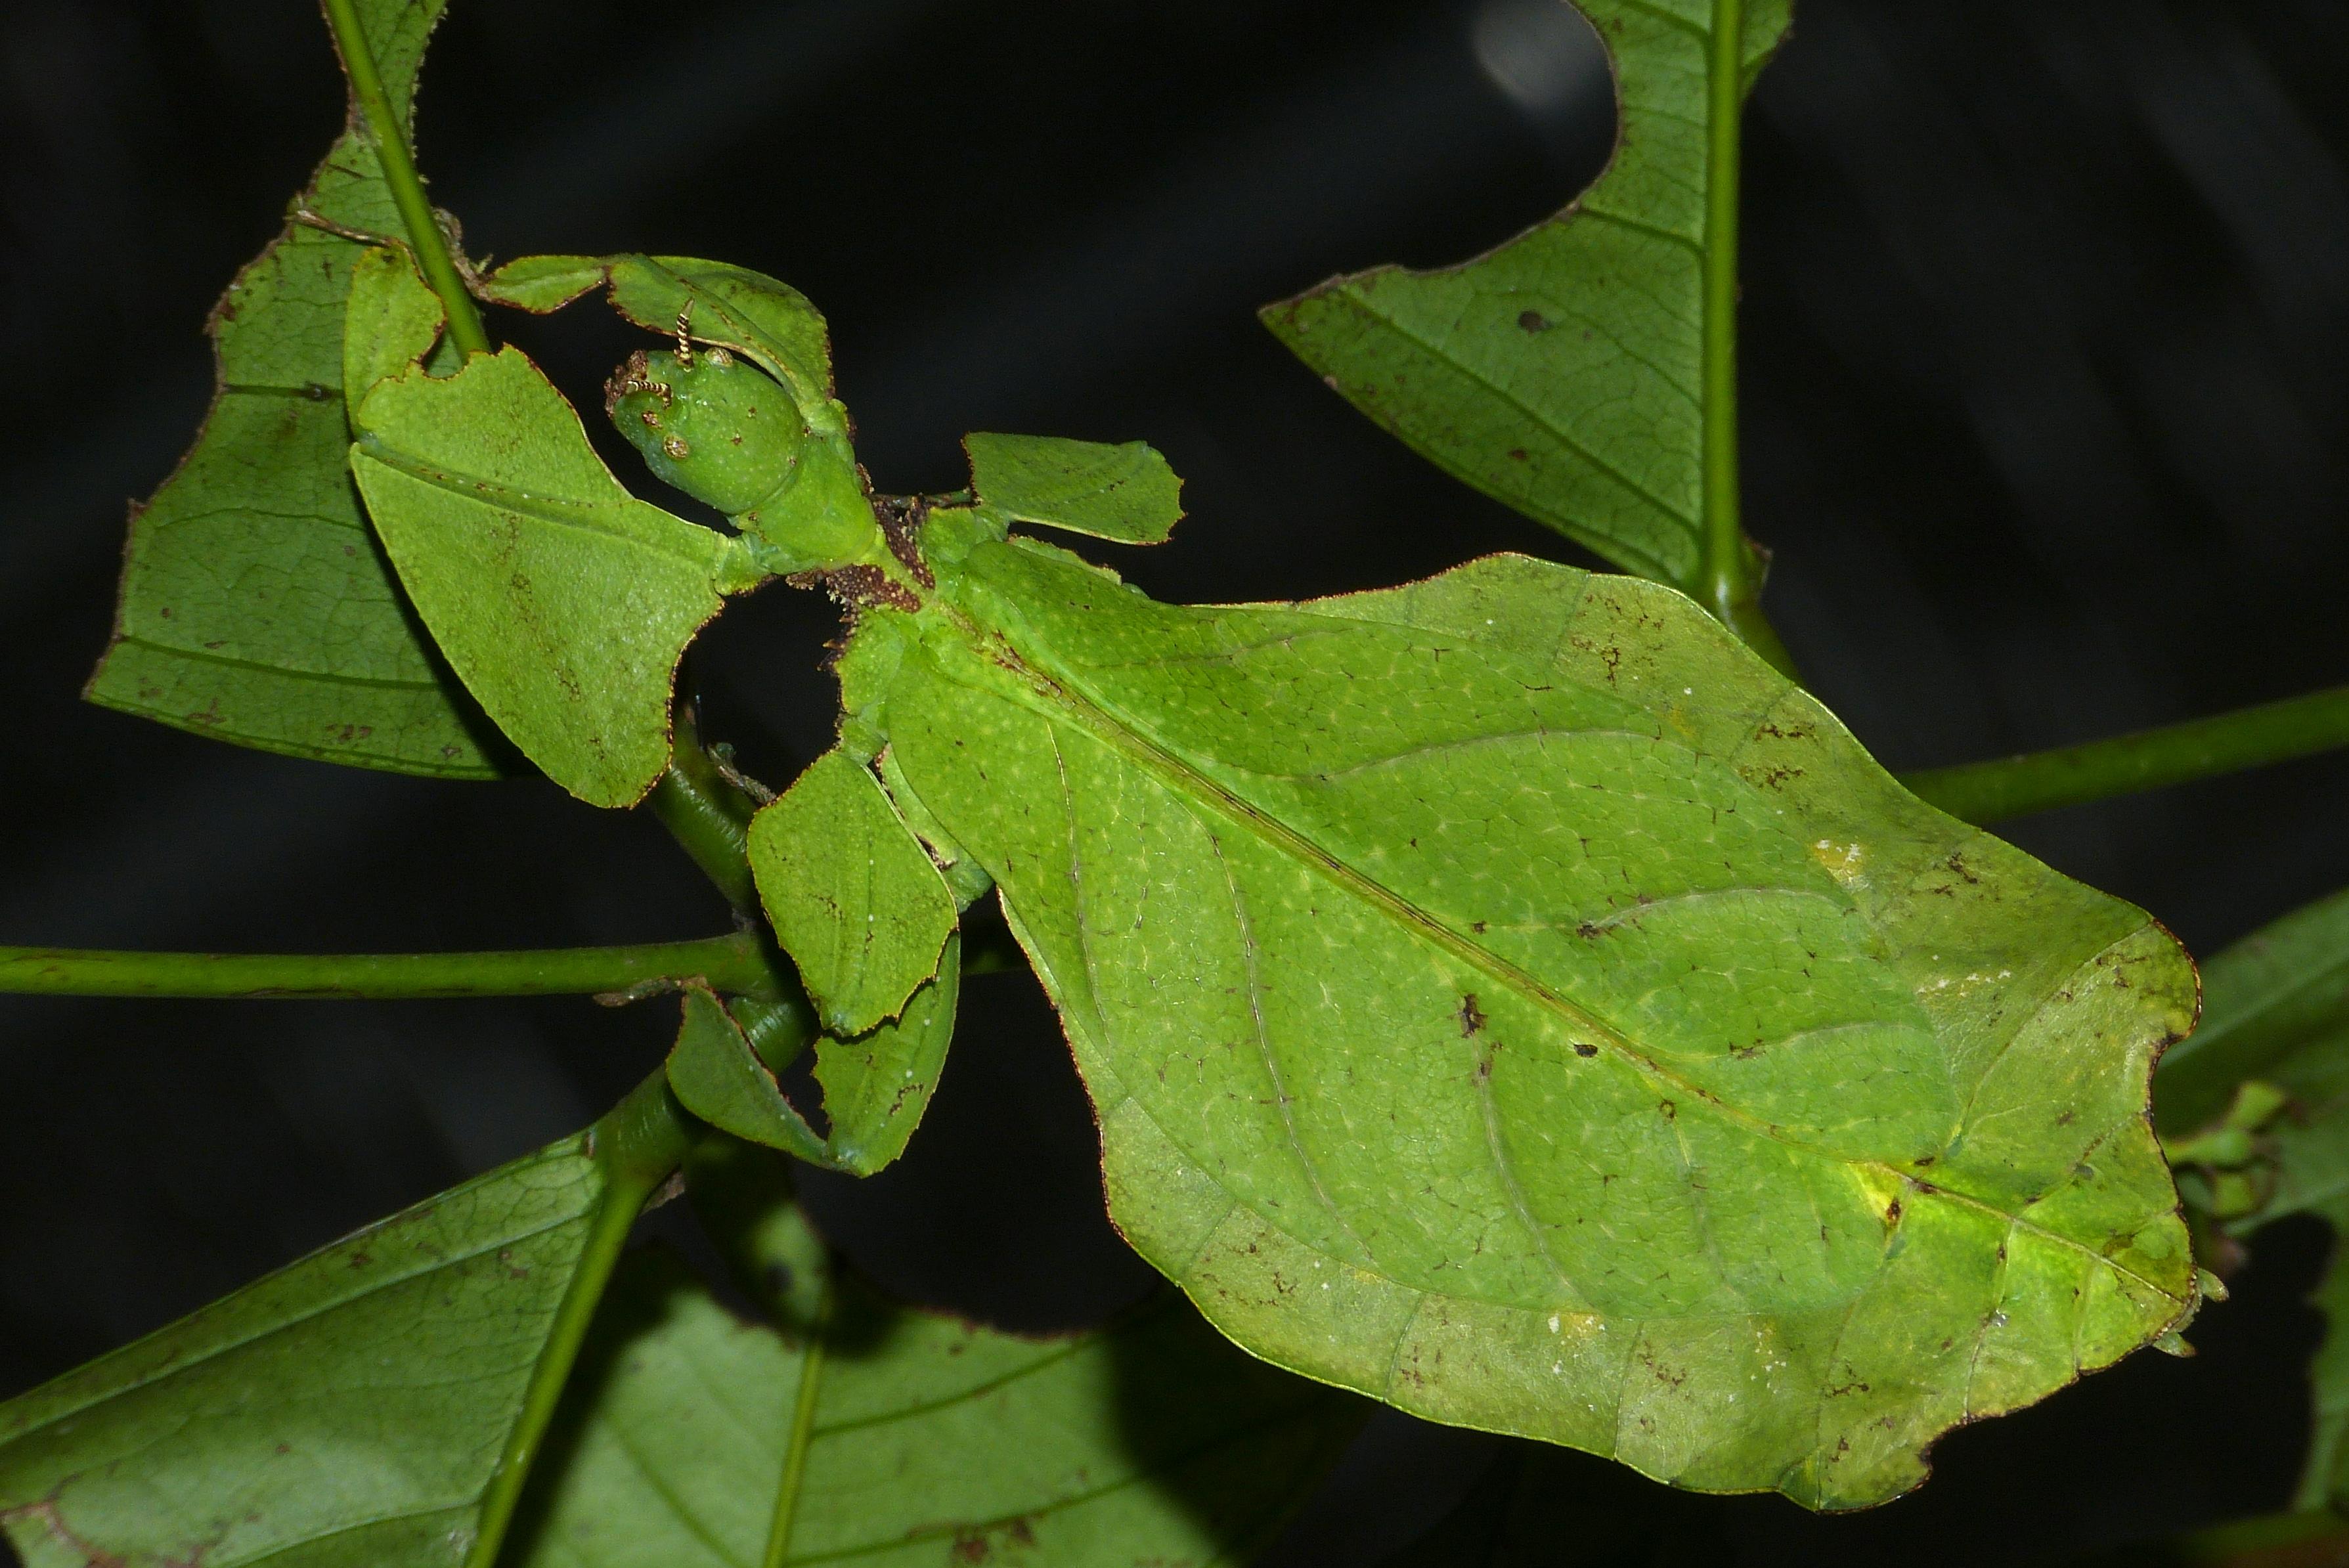 File:Giant Leaf Insect (Phyllium giganteum) (8757147425 ...